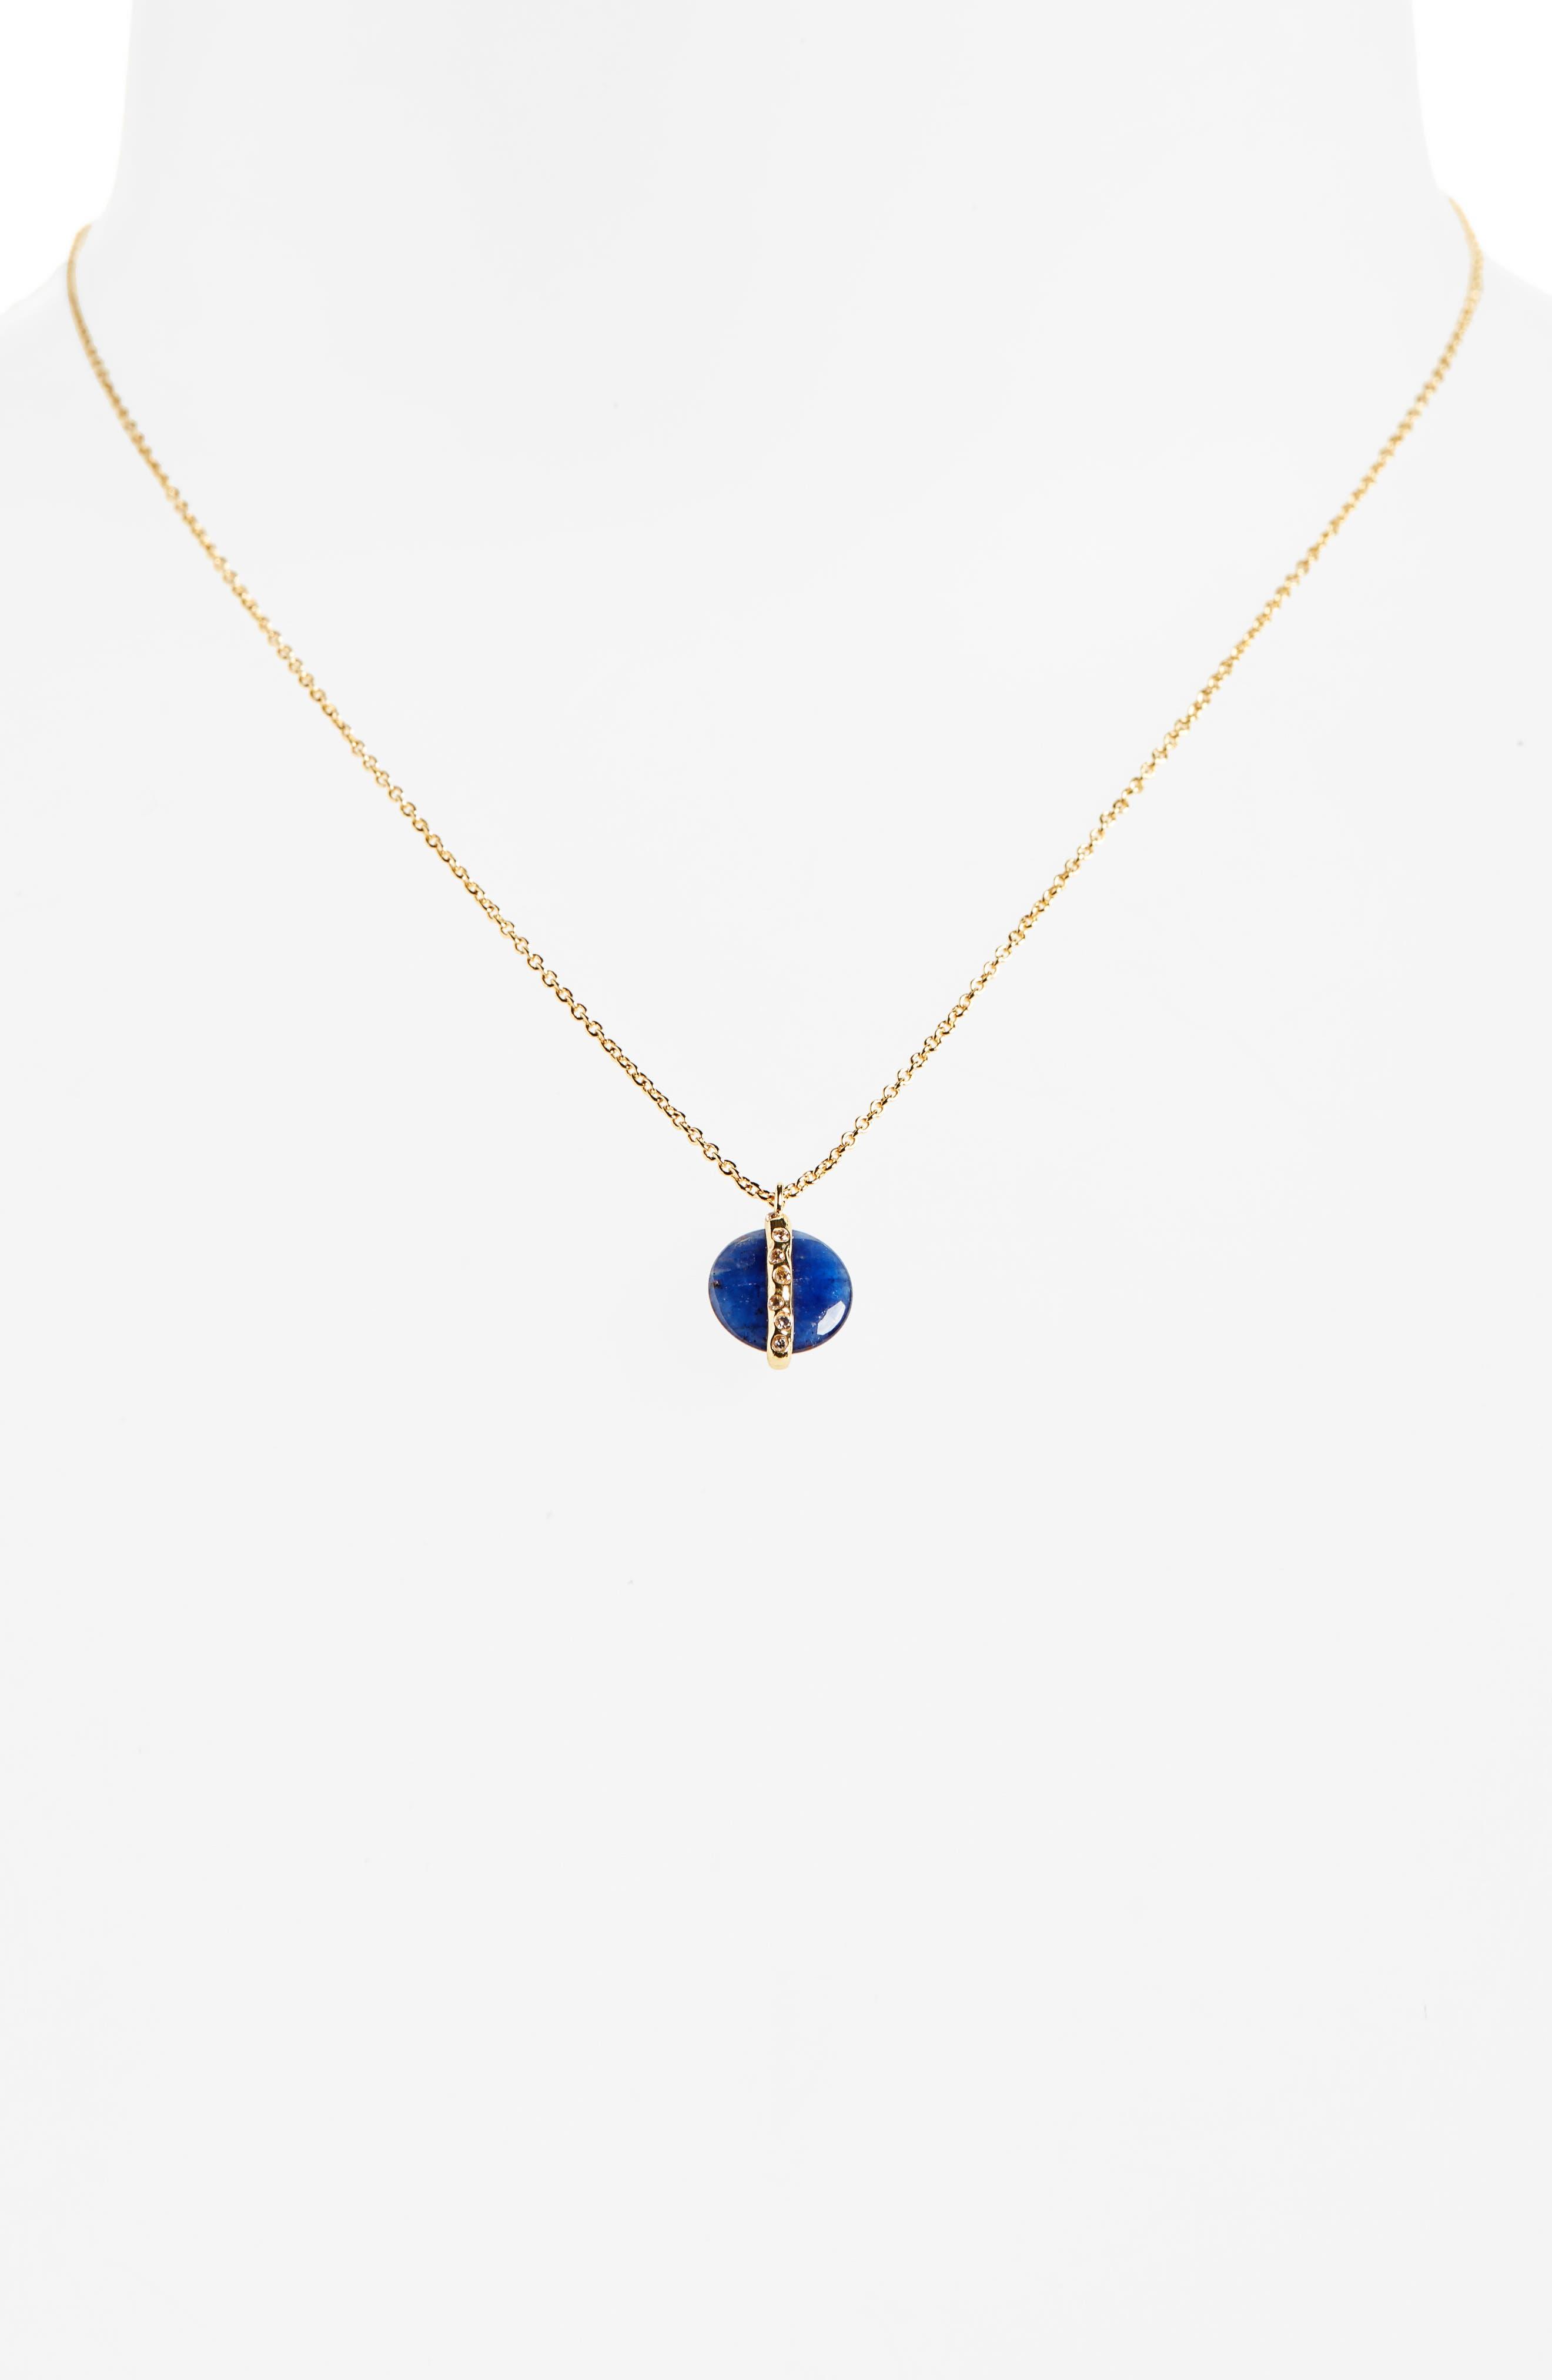 Brinn Shimmer Pendant Necklace,                             Main thumbnail 1, color,                             SODALITE/ GOLD